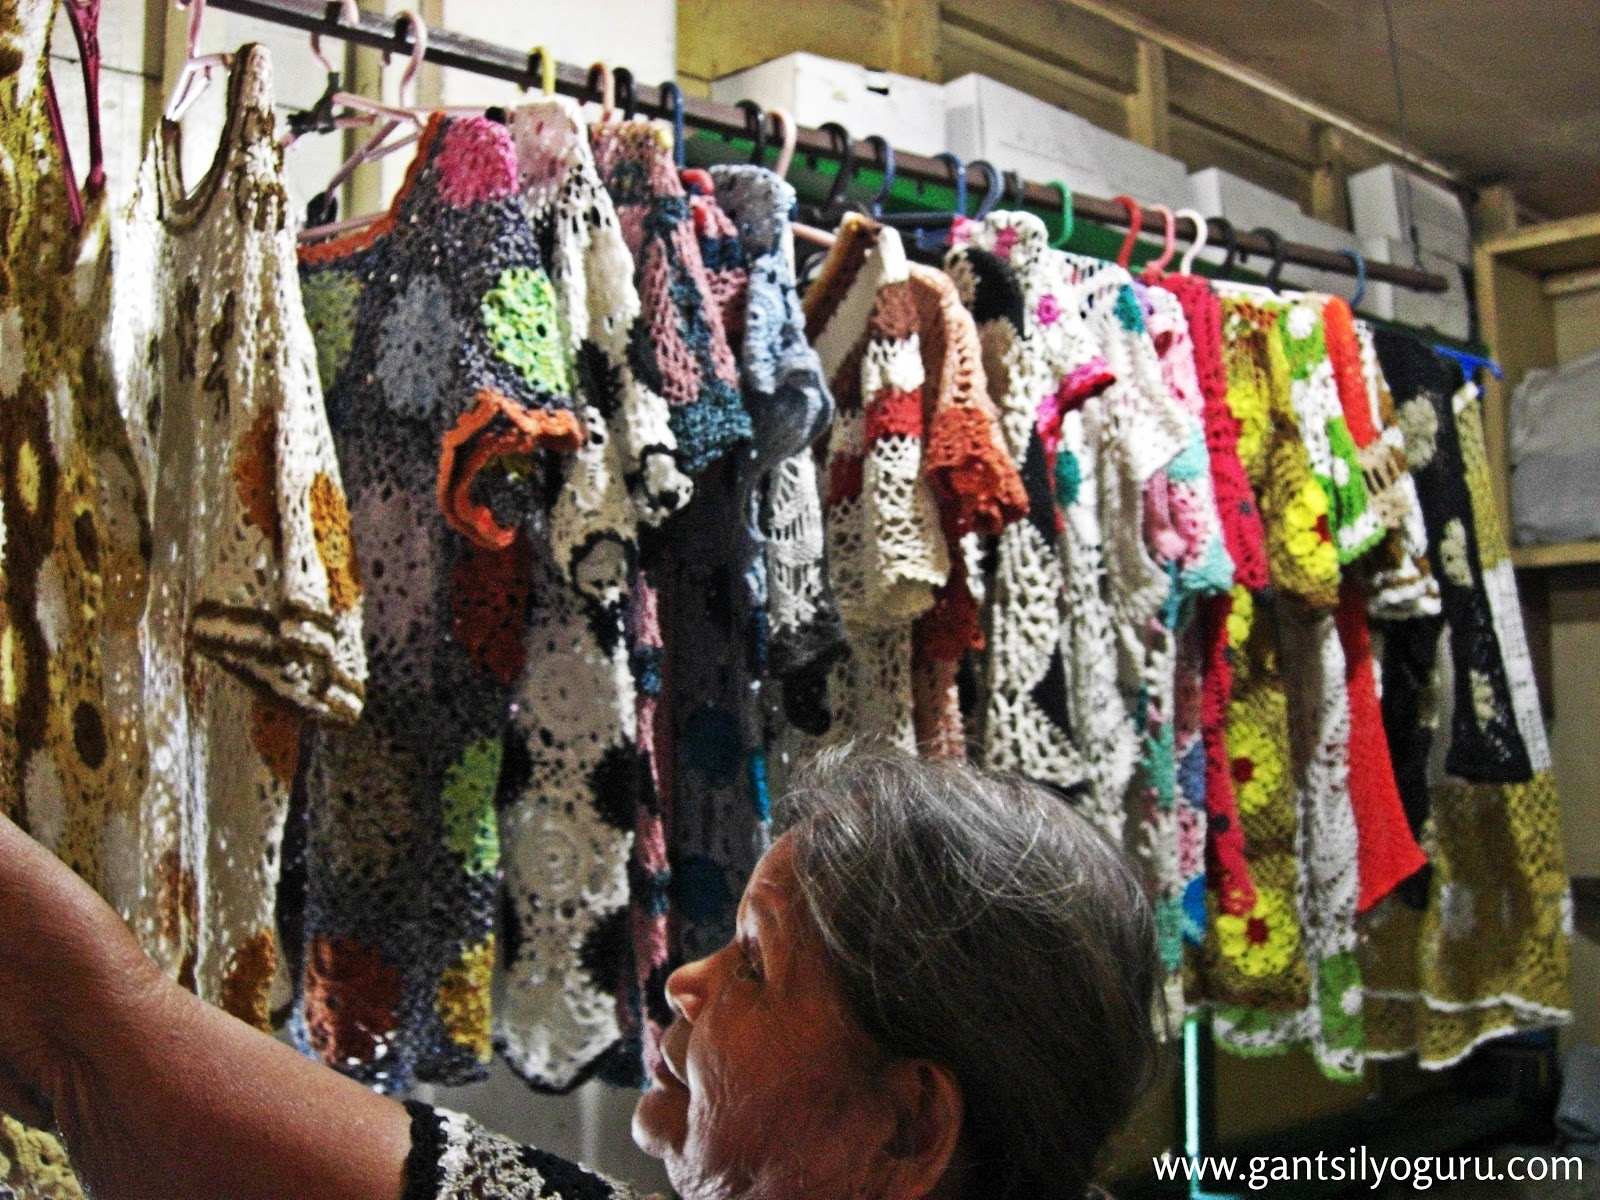 Gantsilyo Guru Grandma Series 4 The Motherload Of All Crocheted